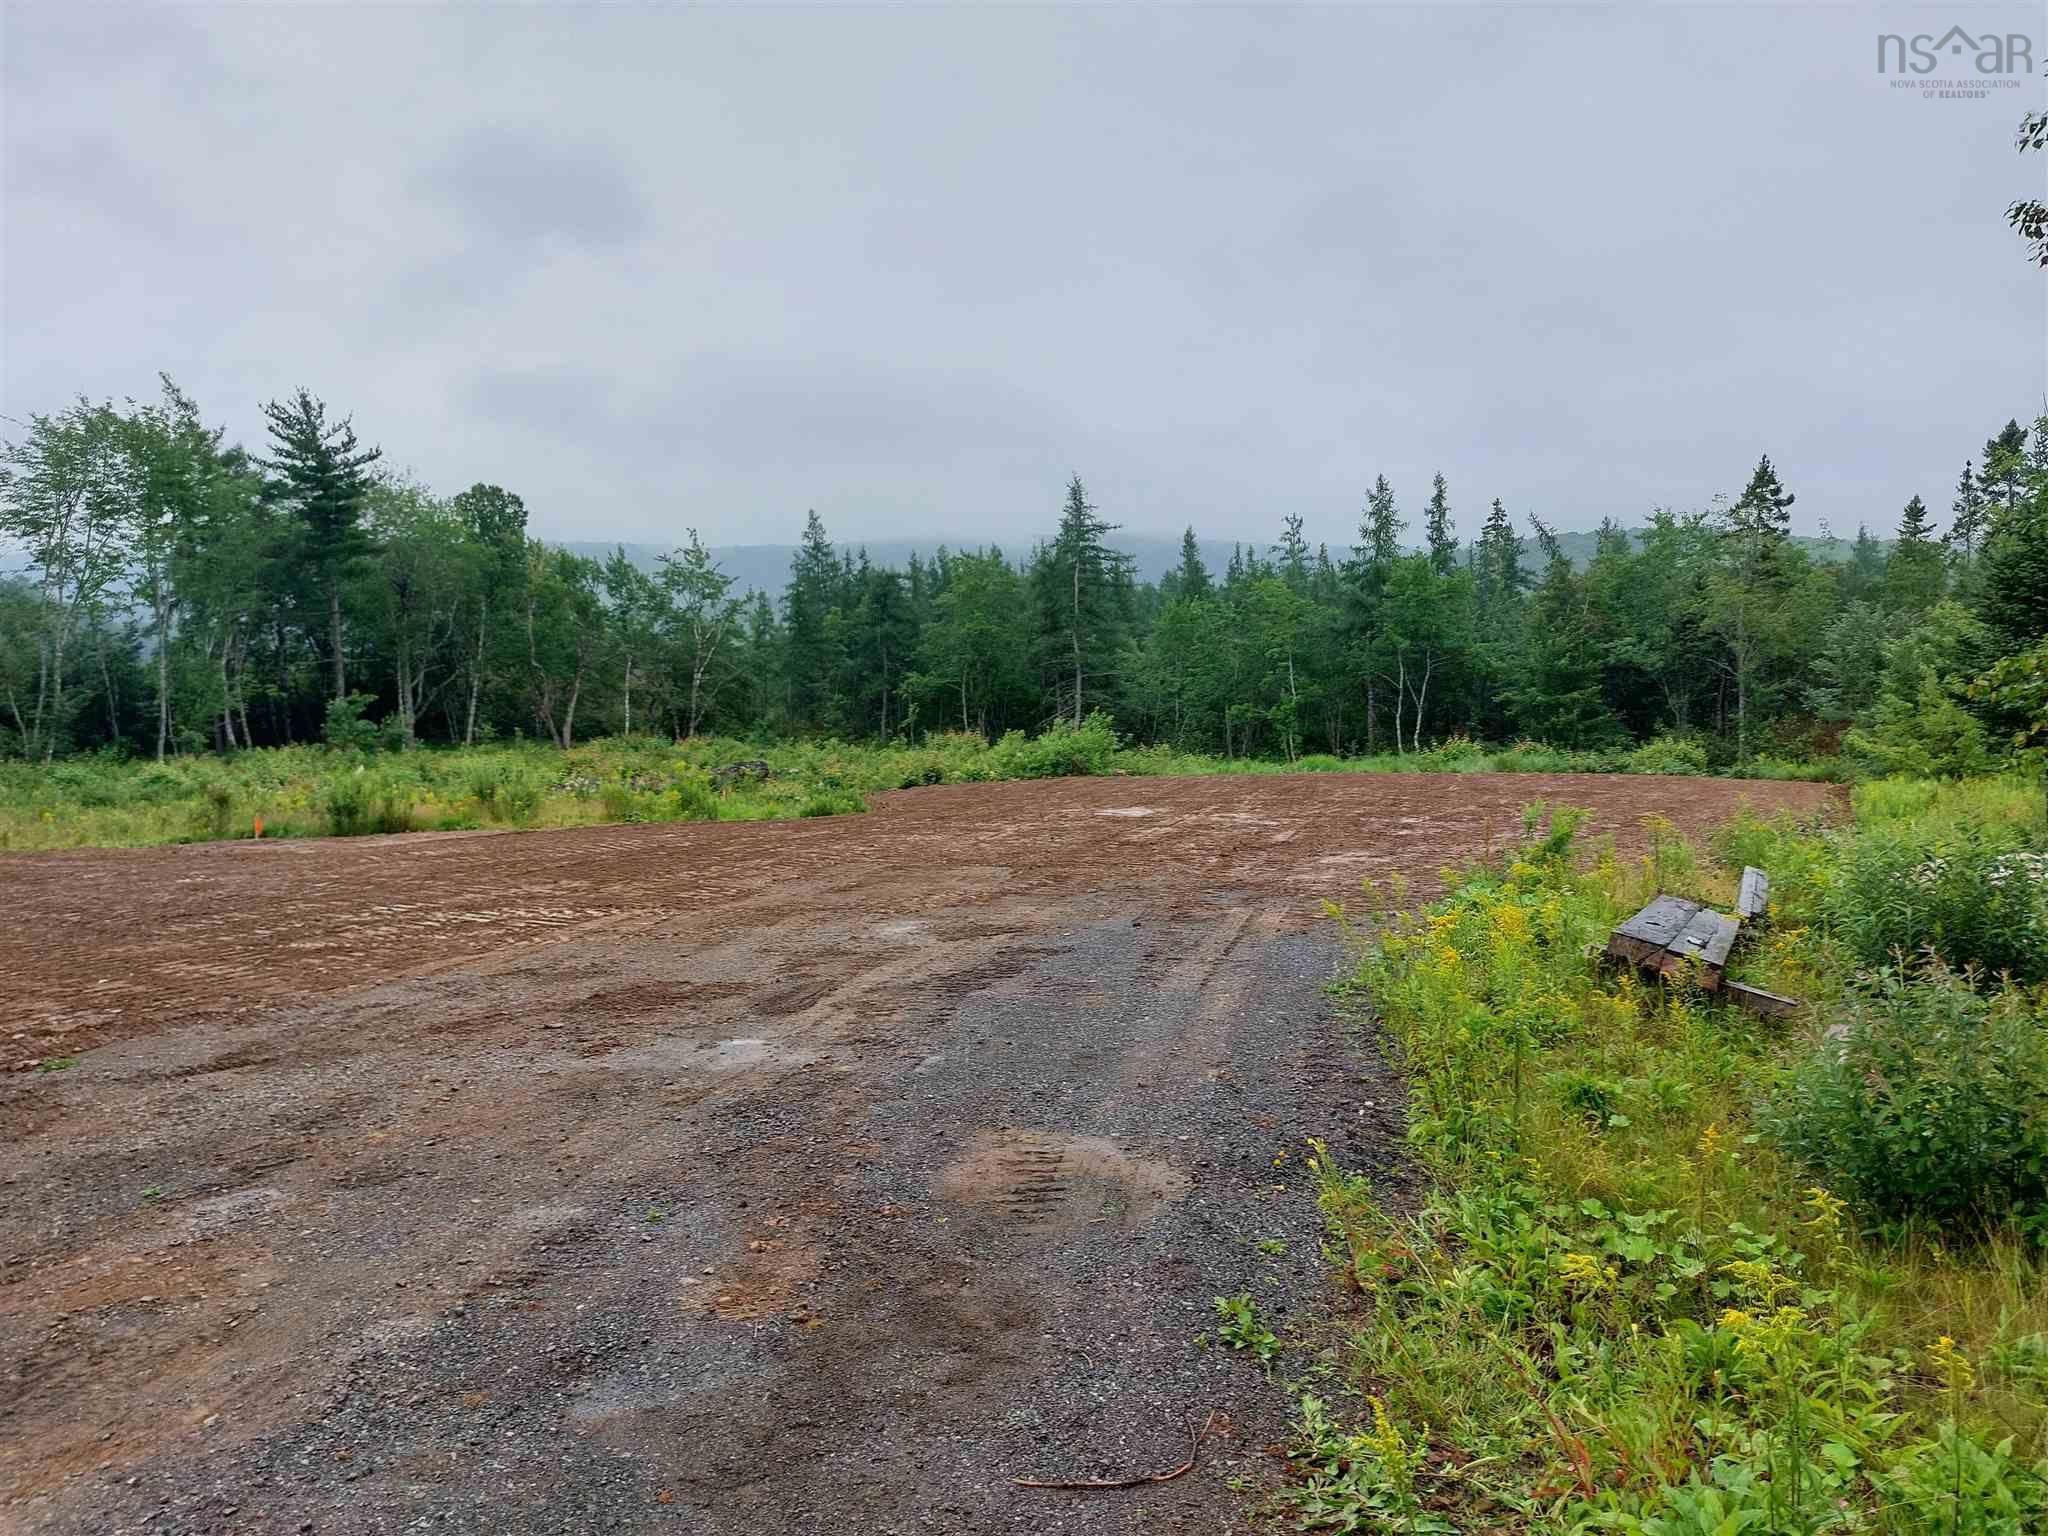 Main Photo: 6326 348 Highway in Glenelg: 303-Guysborough County Vacant Land for sale (Highland Region)  : MLS®# 202121589